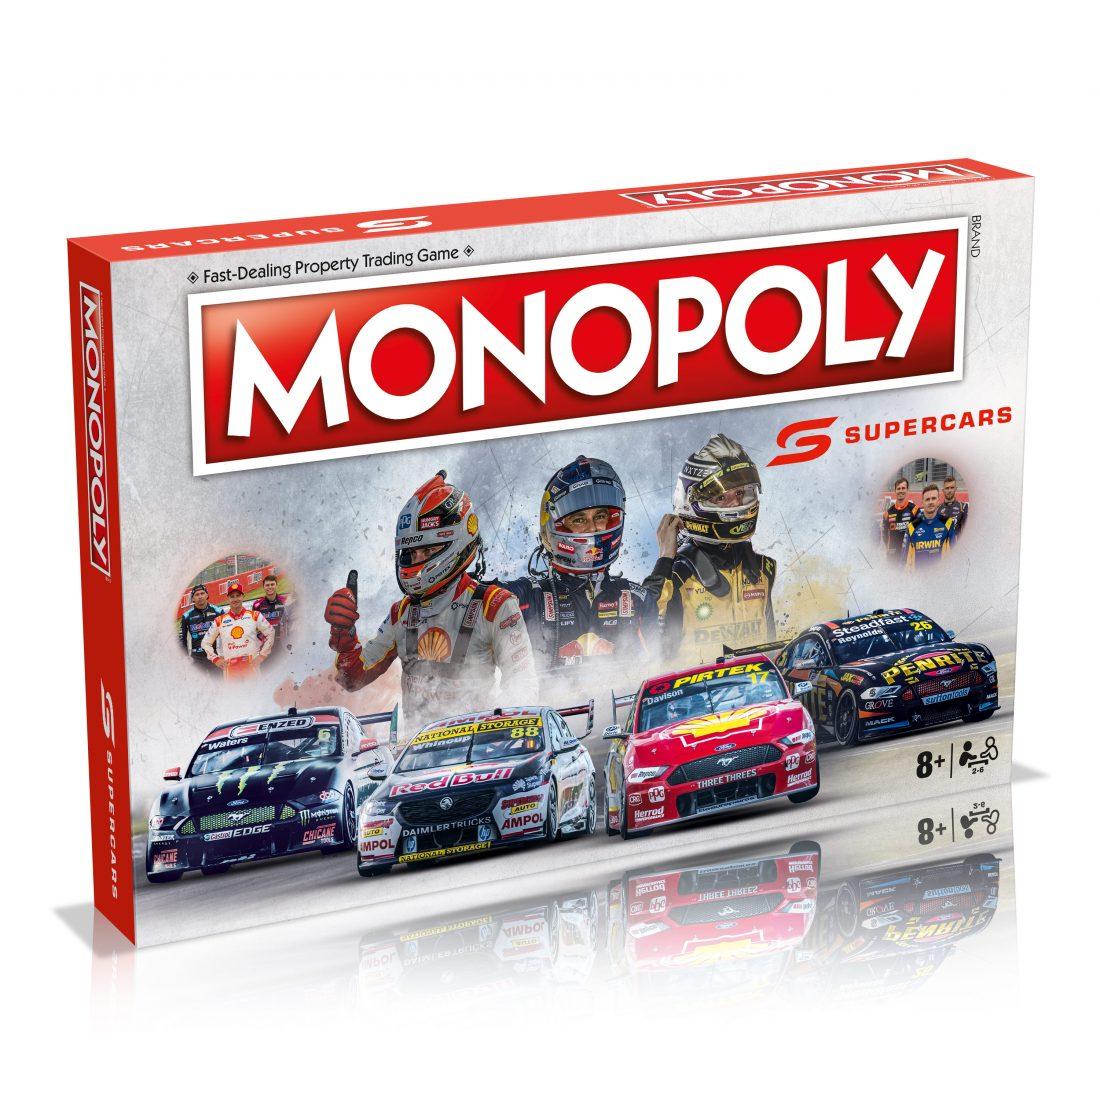 NCR GM Monopoly